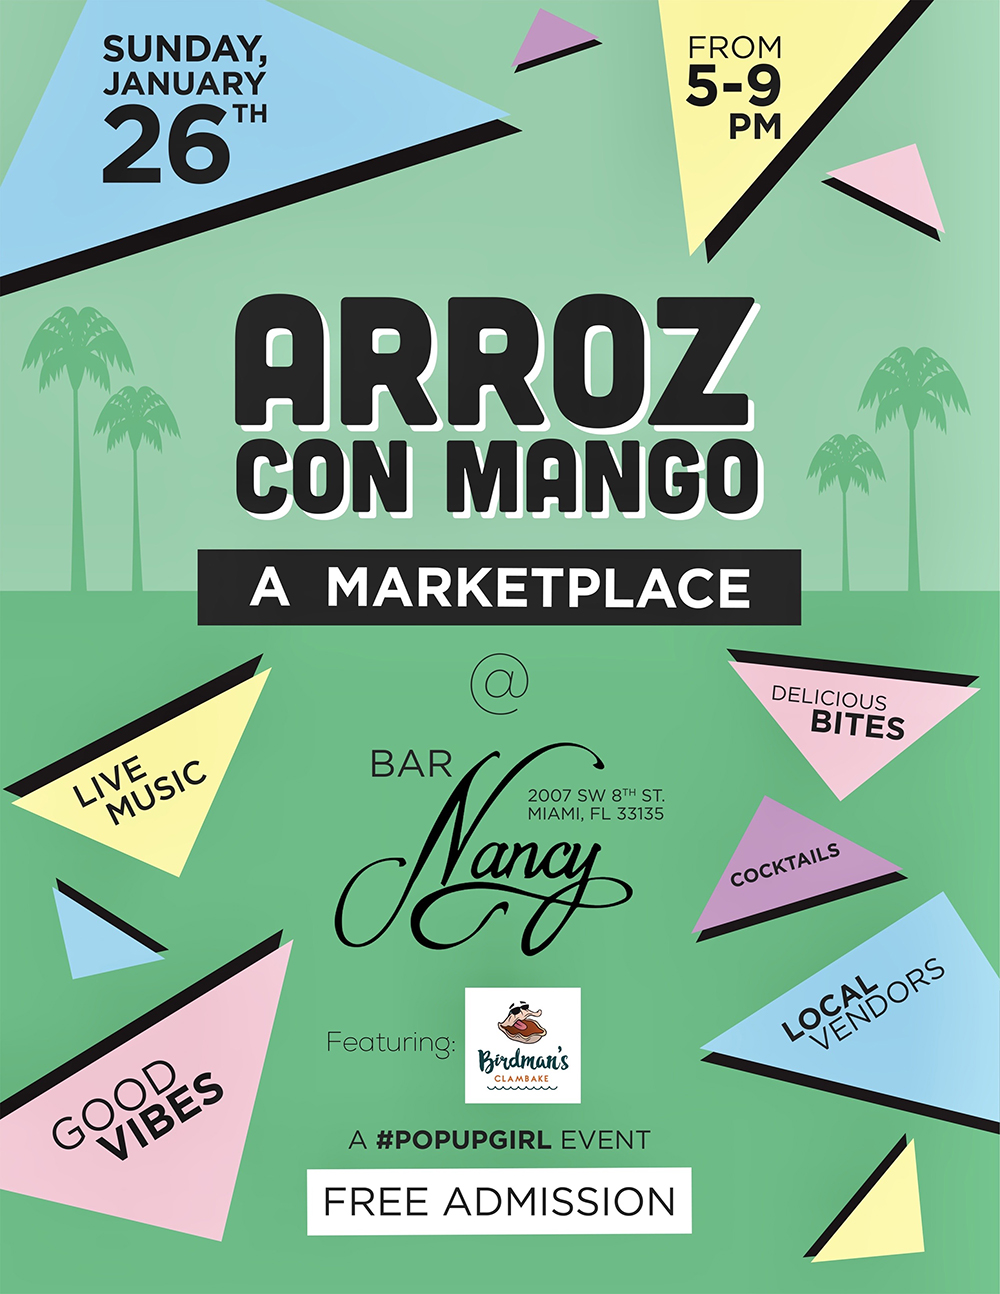 Arroz Con Mango! A Marketplace! Feat. Birdman's Clambake! @ Bar Nancy